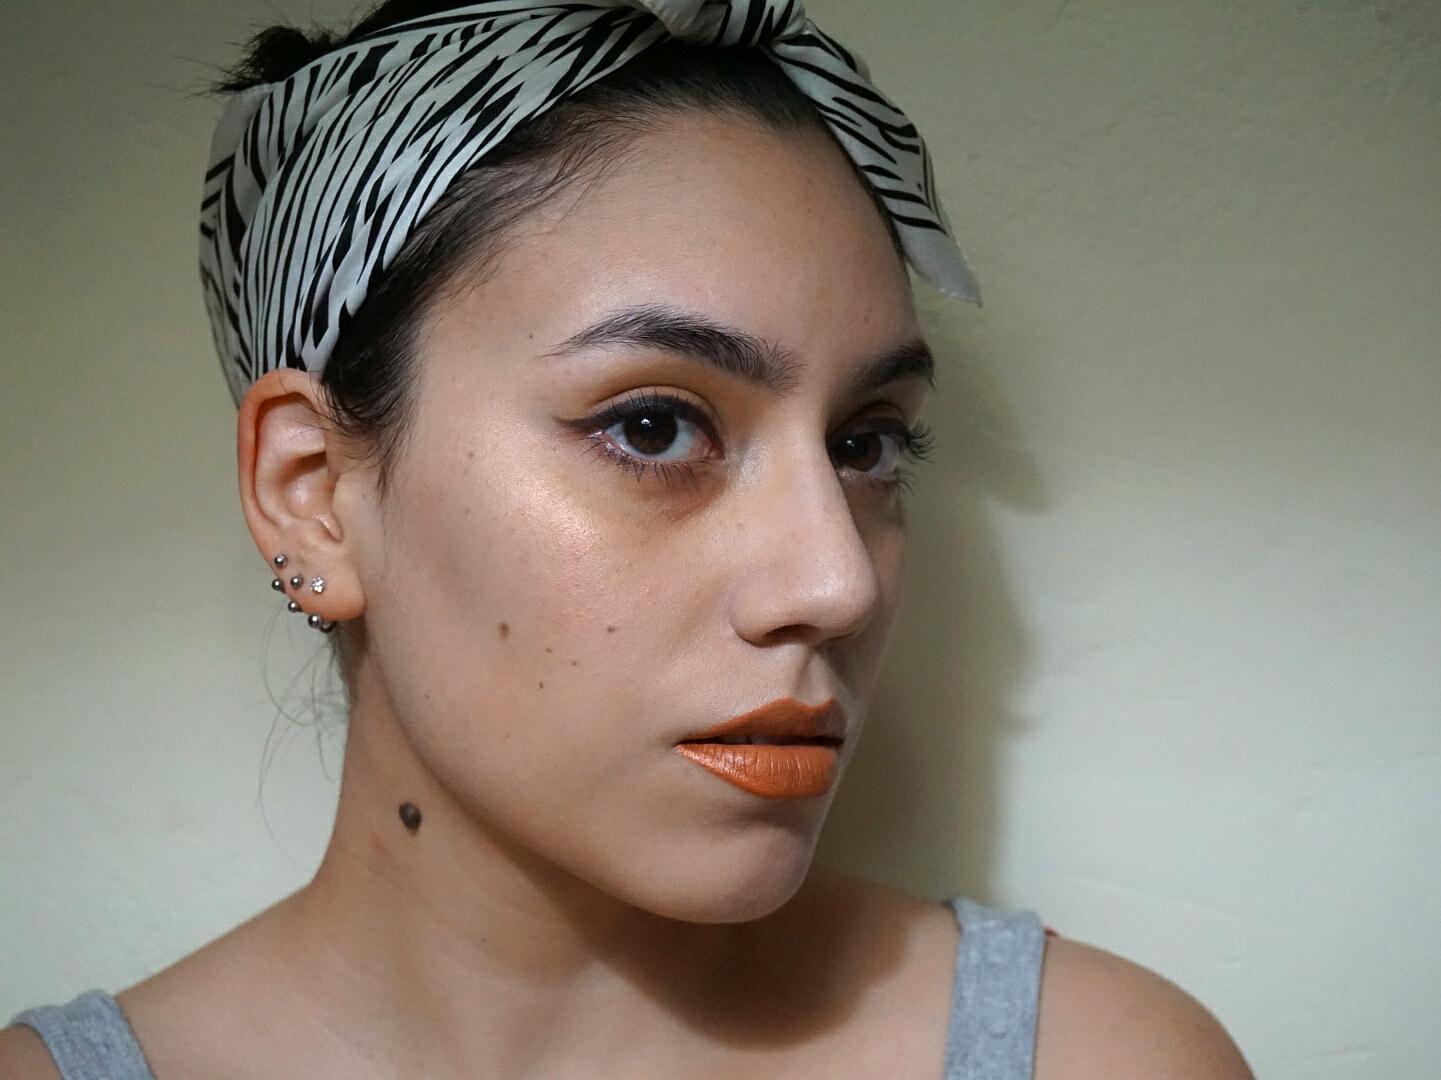 Cynthia/Killikill: Lipstick play, mixing and amping.